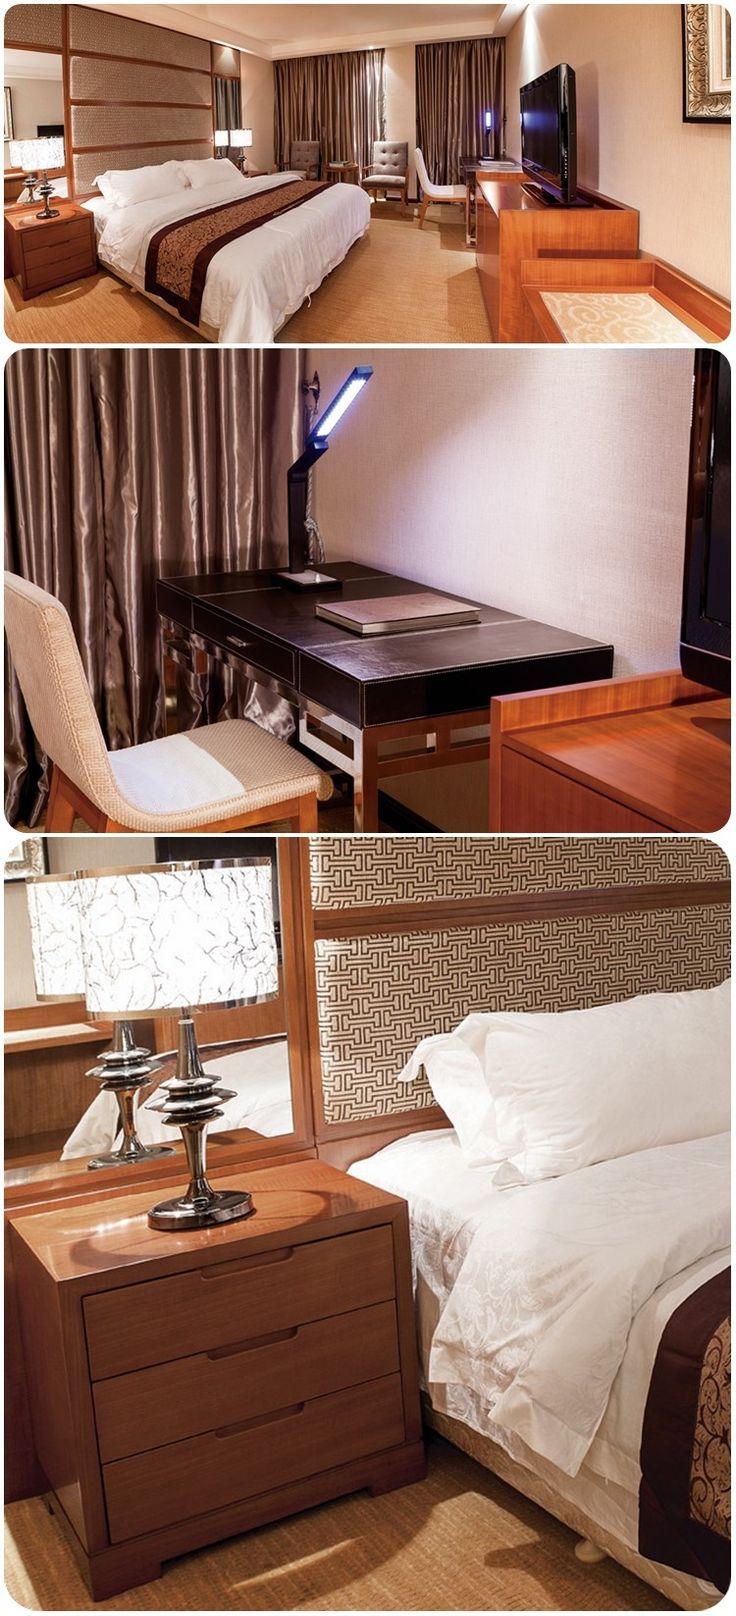 XIANGYUAN 2016 foshan cheap Solid Wood Hotel bedroom